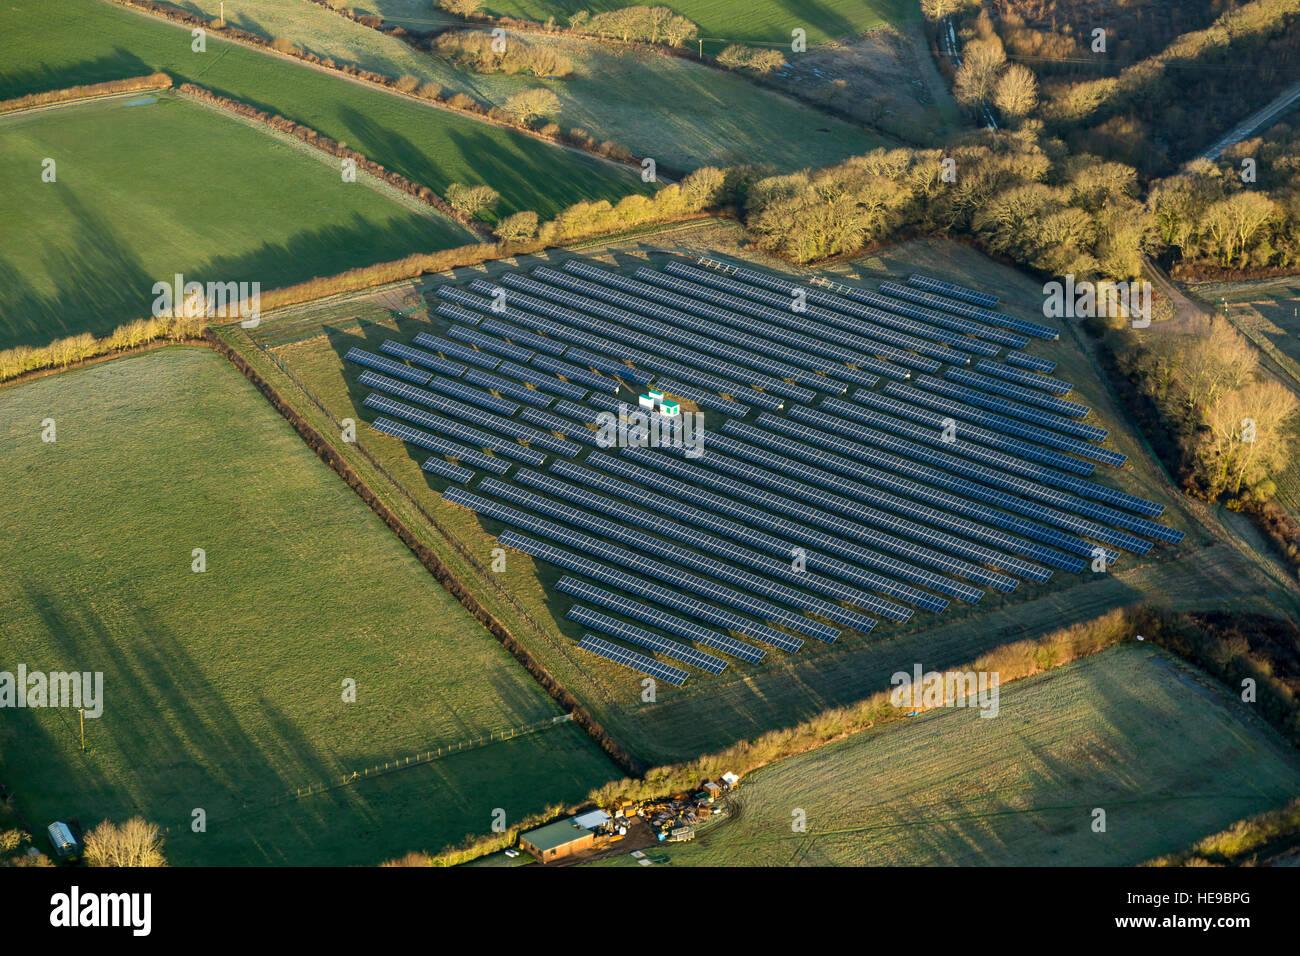 Aerial view of solar panel array, farm England - Stock Image